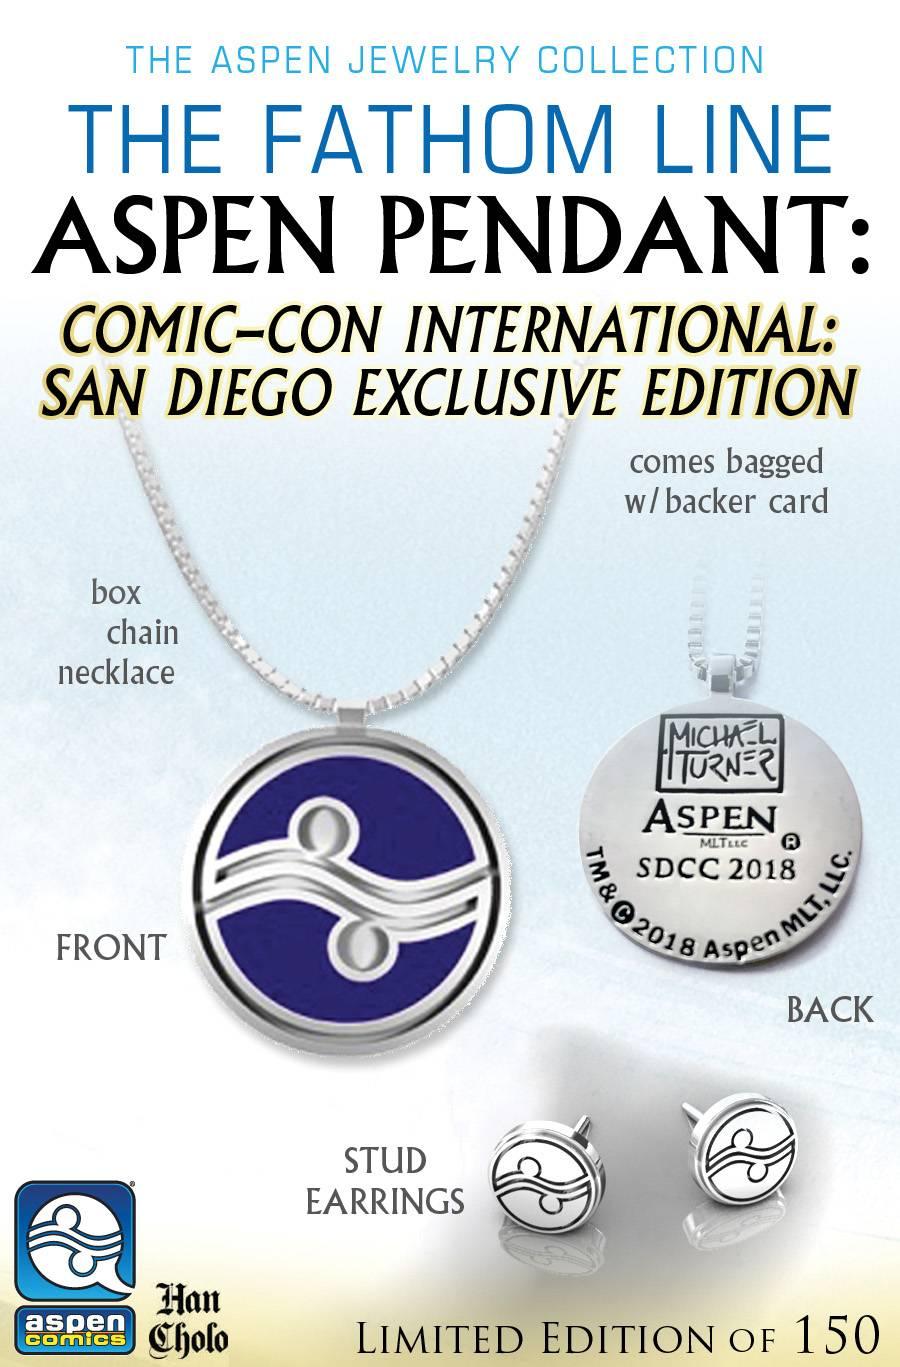 SDCC 2018 ASPEN PENDANT & EARRINGS SET